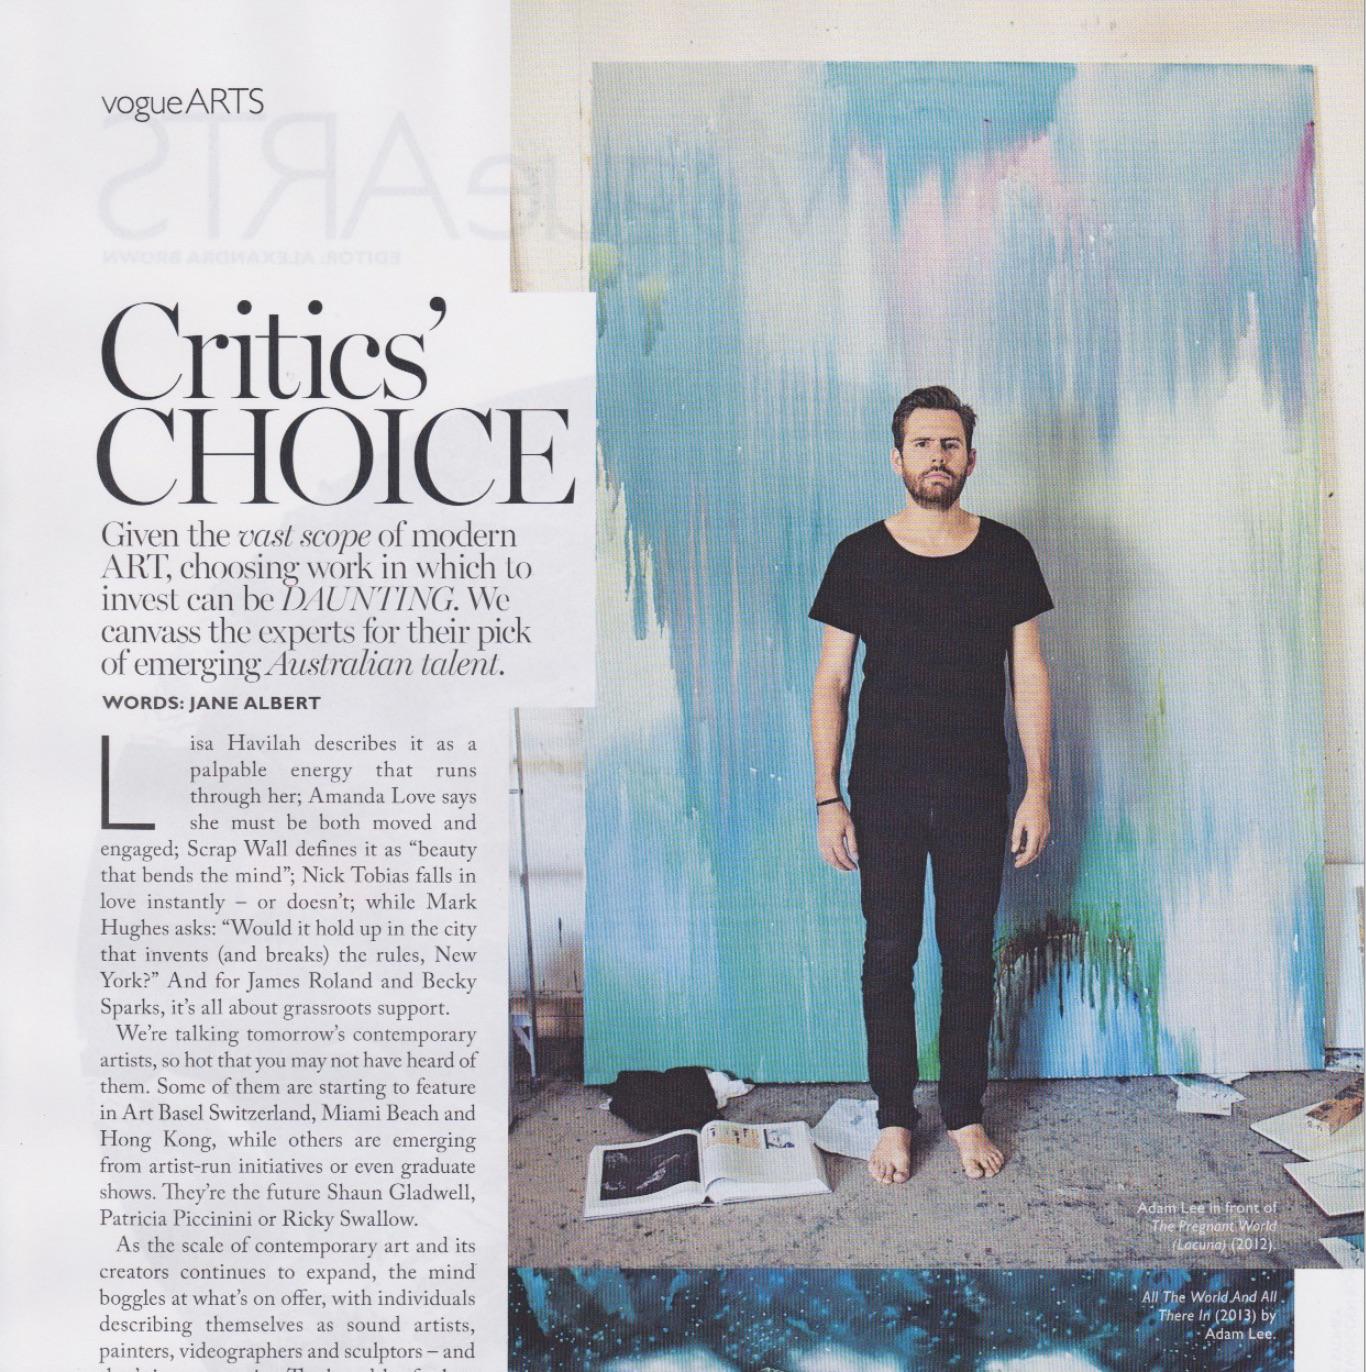 Vogue preview